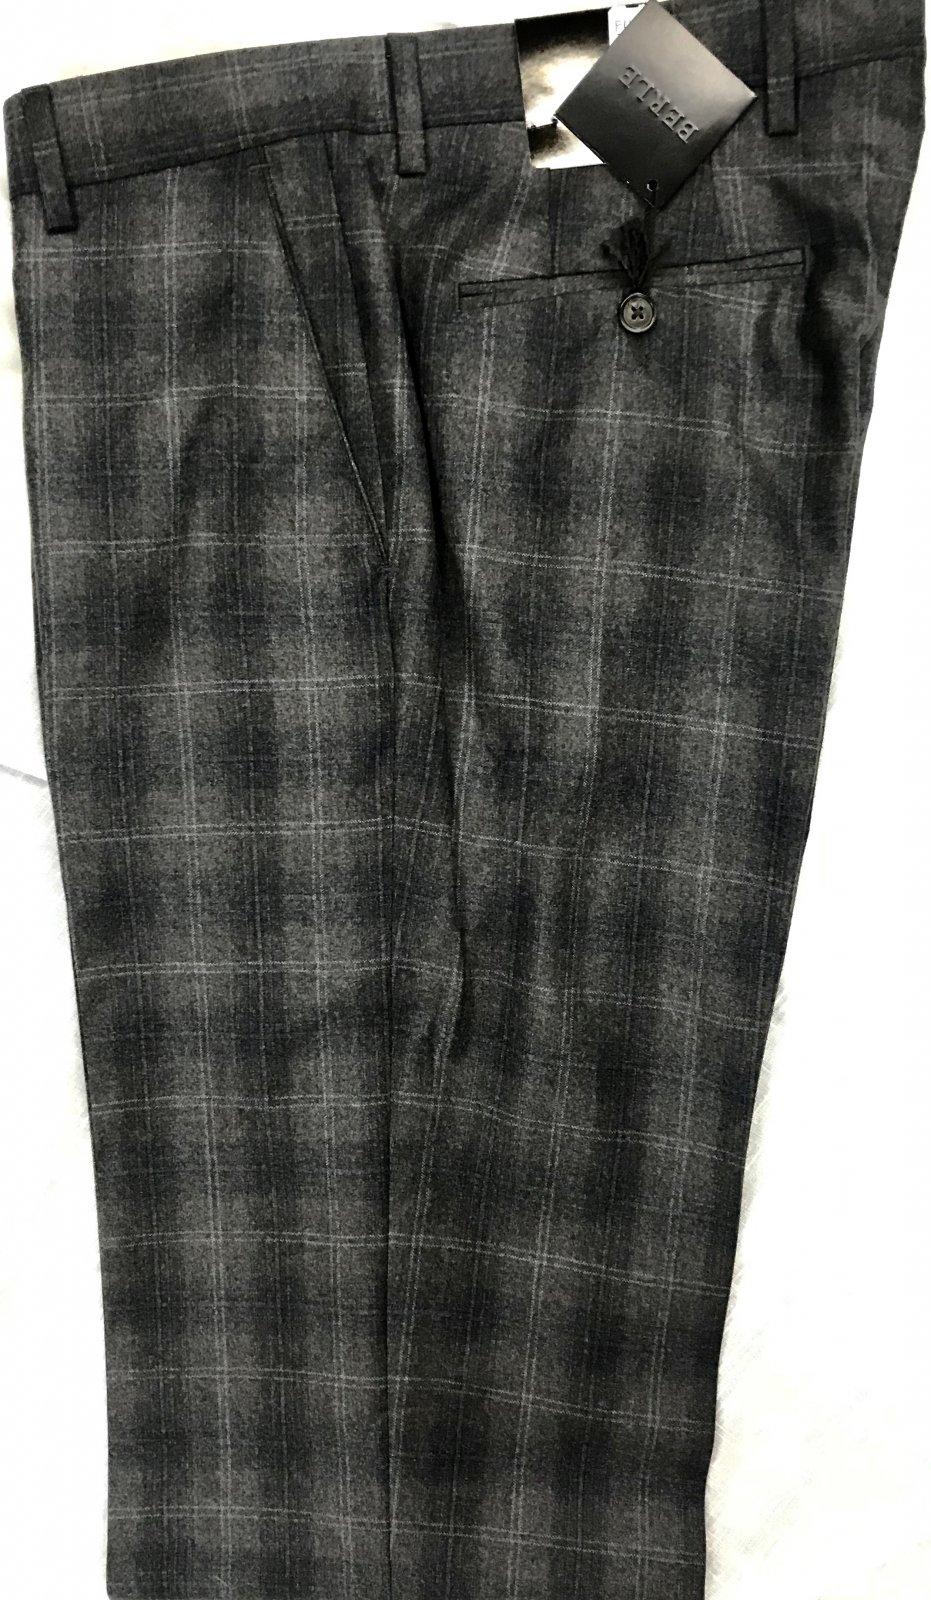 Berle Flannel Pant 8812-28